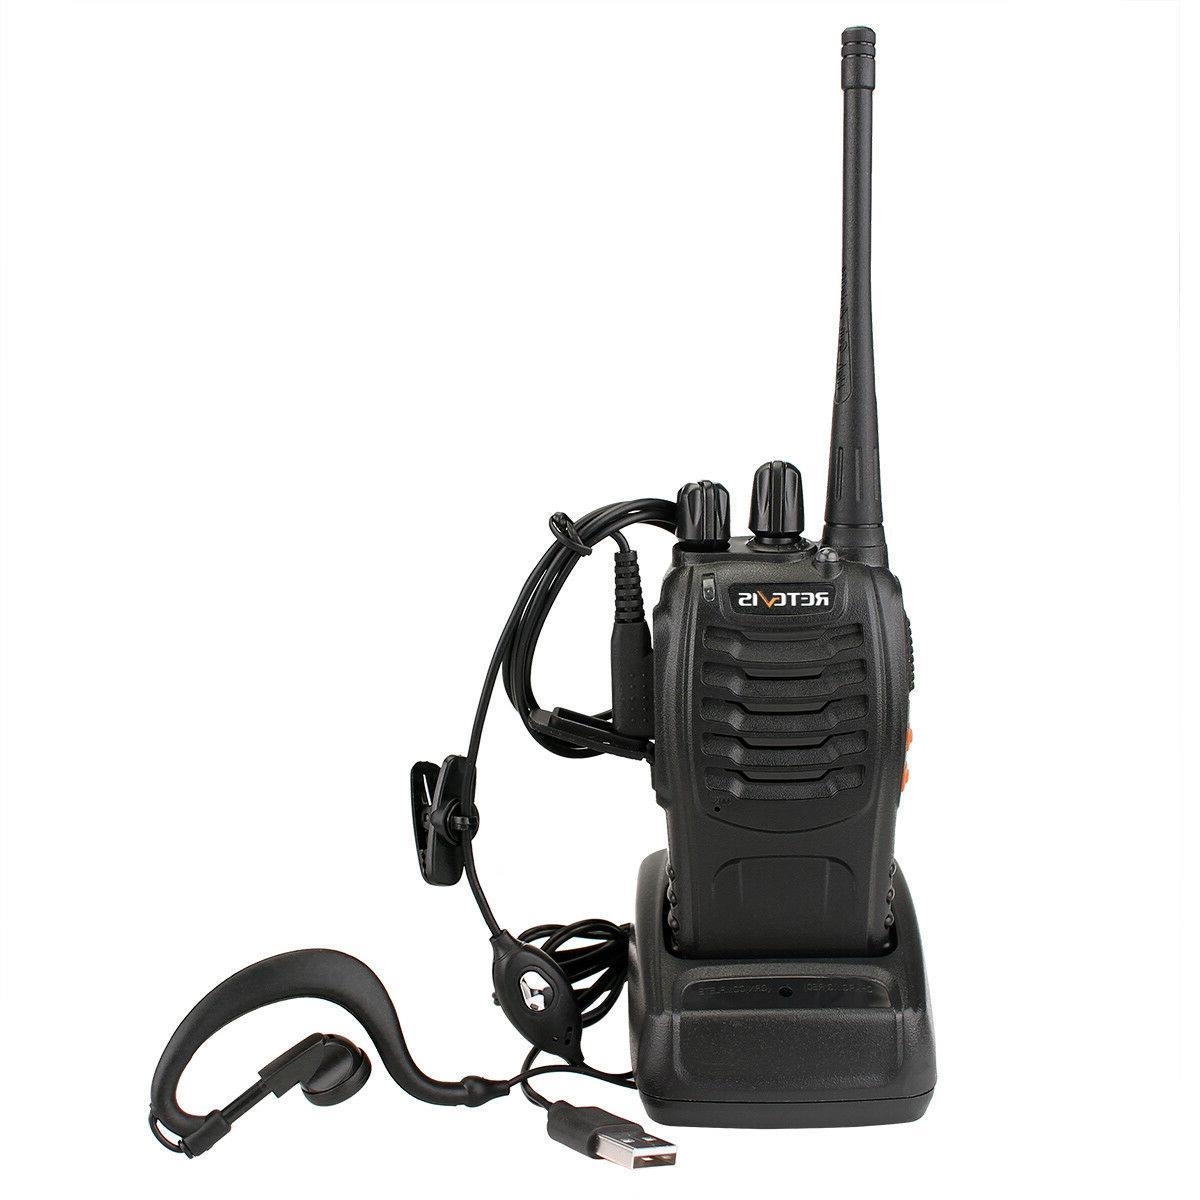 Walkie Talkies UHF VOX Radio+Earpiece+PTT Speaker Mic US